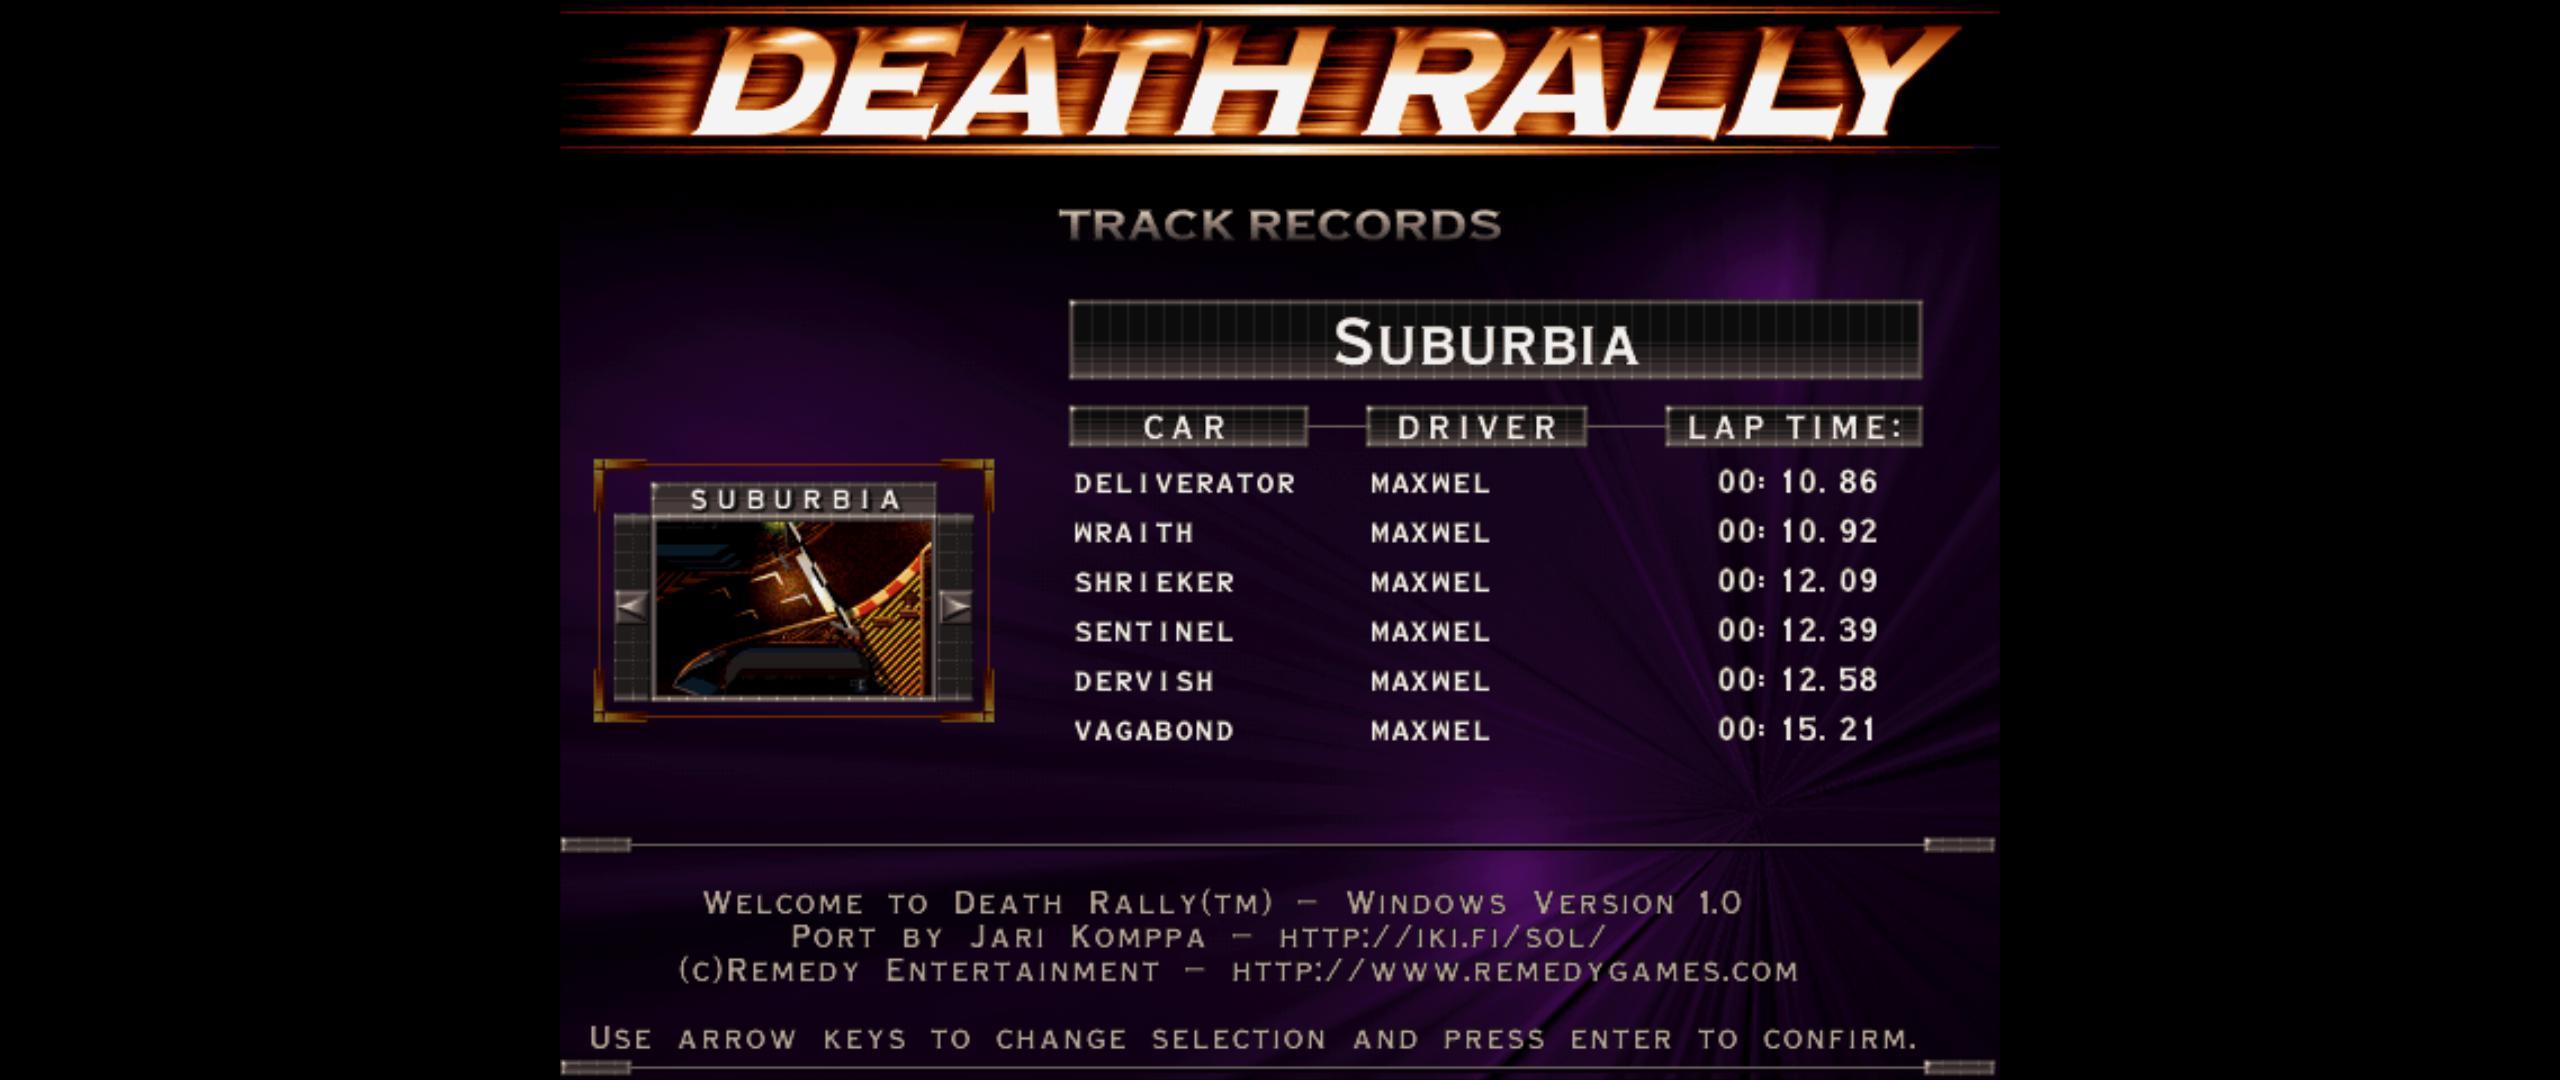 Maxwel: Death Rally [Suburbia, Dervish Car Car] (PC) 0:00:12.58 points on 2016-03-01 14:38:25